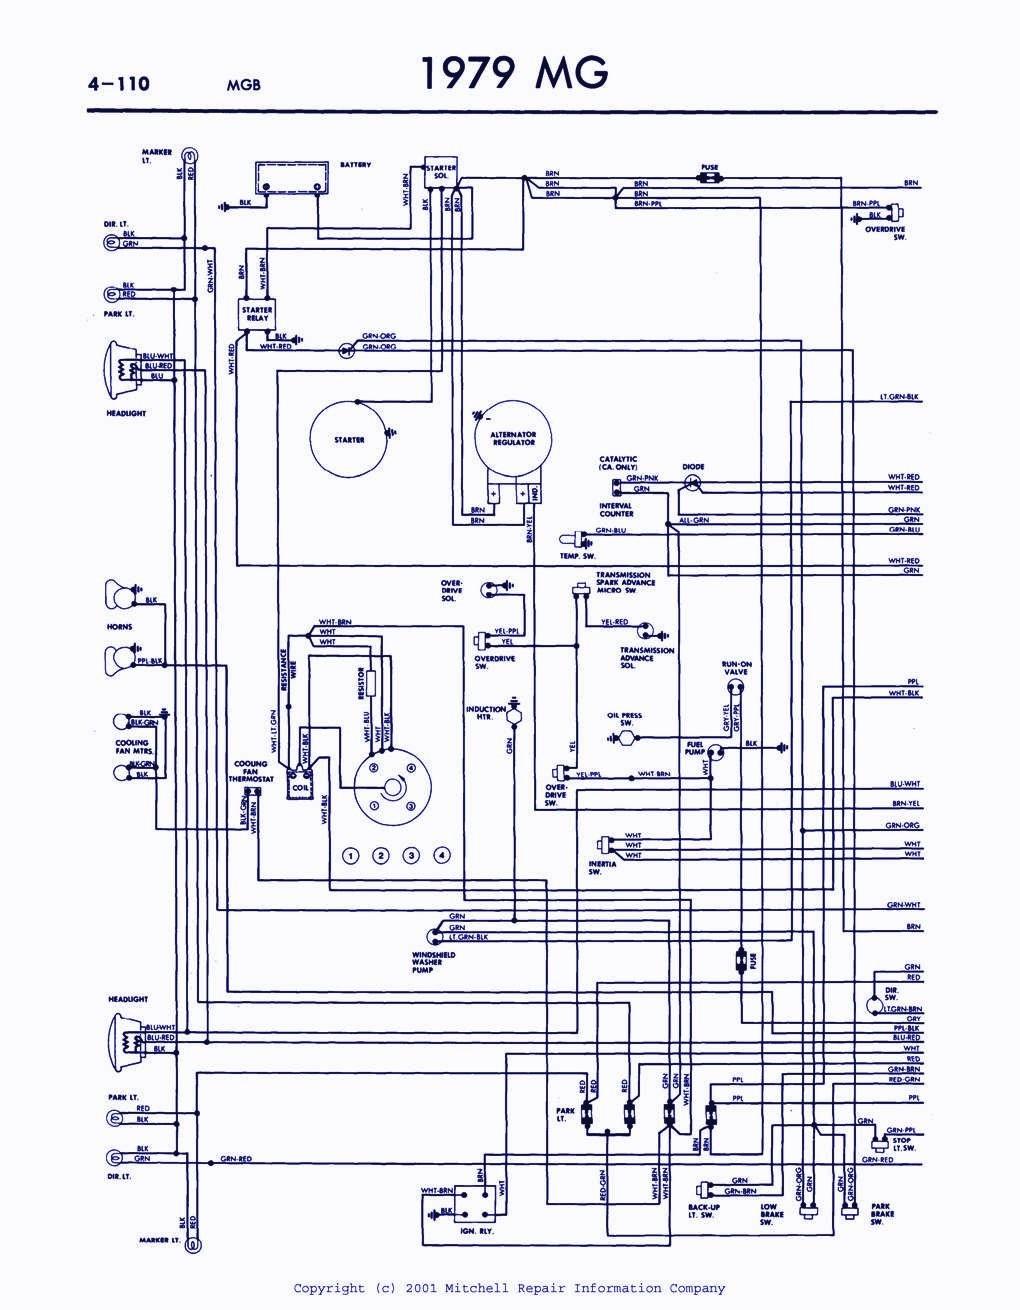 mg wiring diagram elegant 1976 mgb wiring diagram od wire center e280a2 of mg wiring diagram